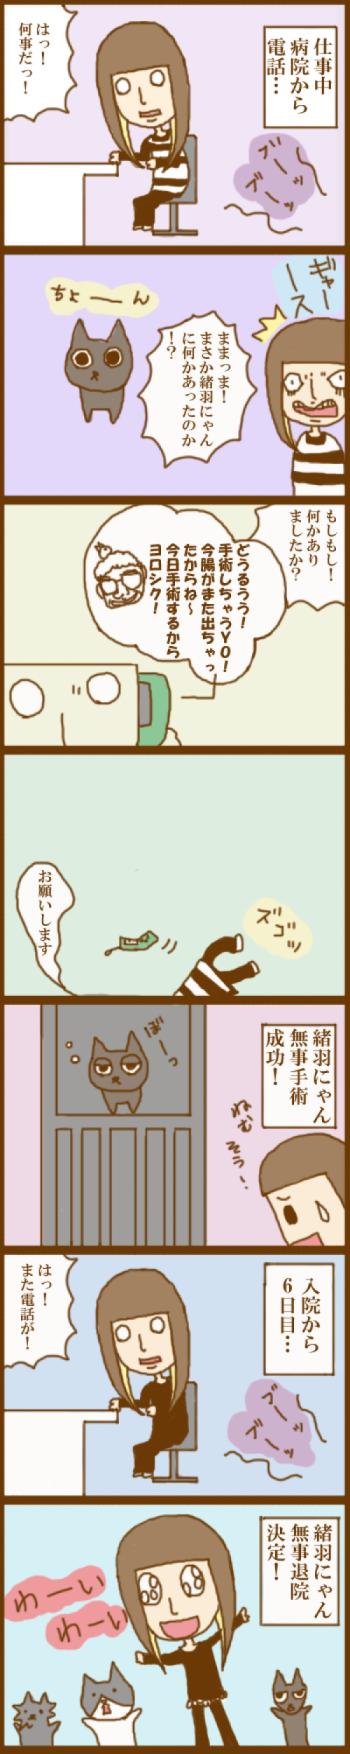 f:id:suzuokayu:20201117092418j:plain